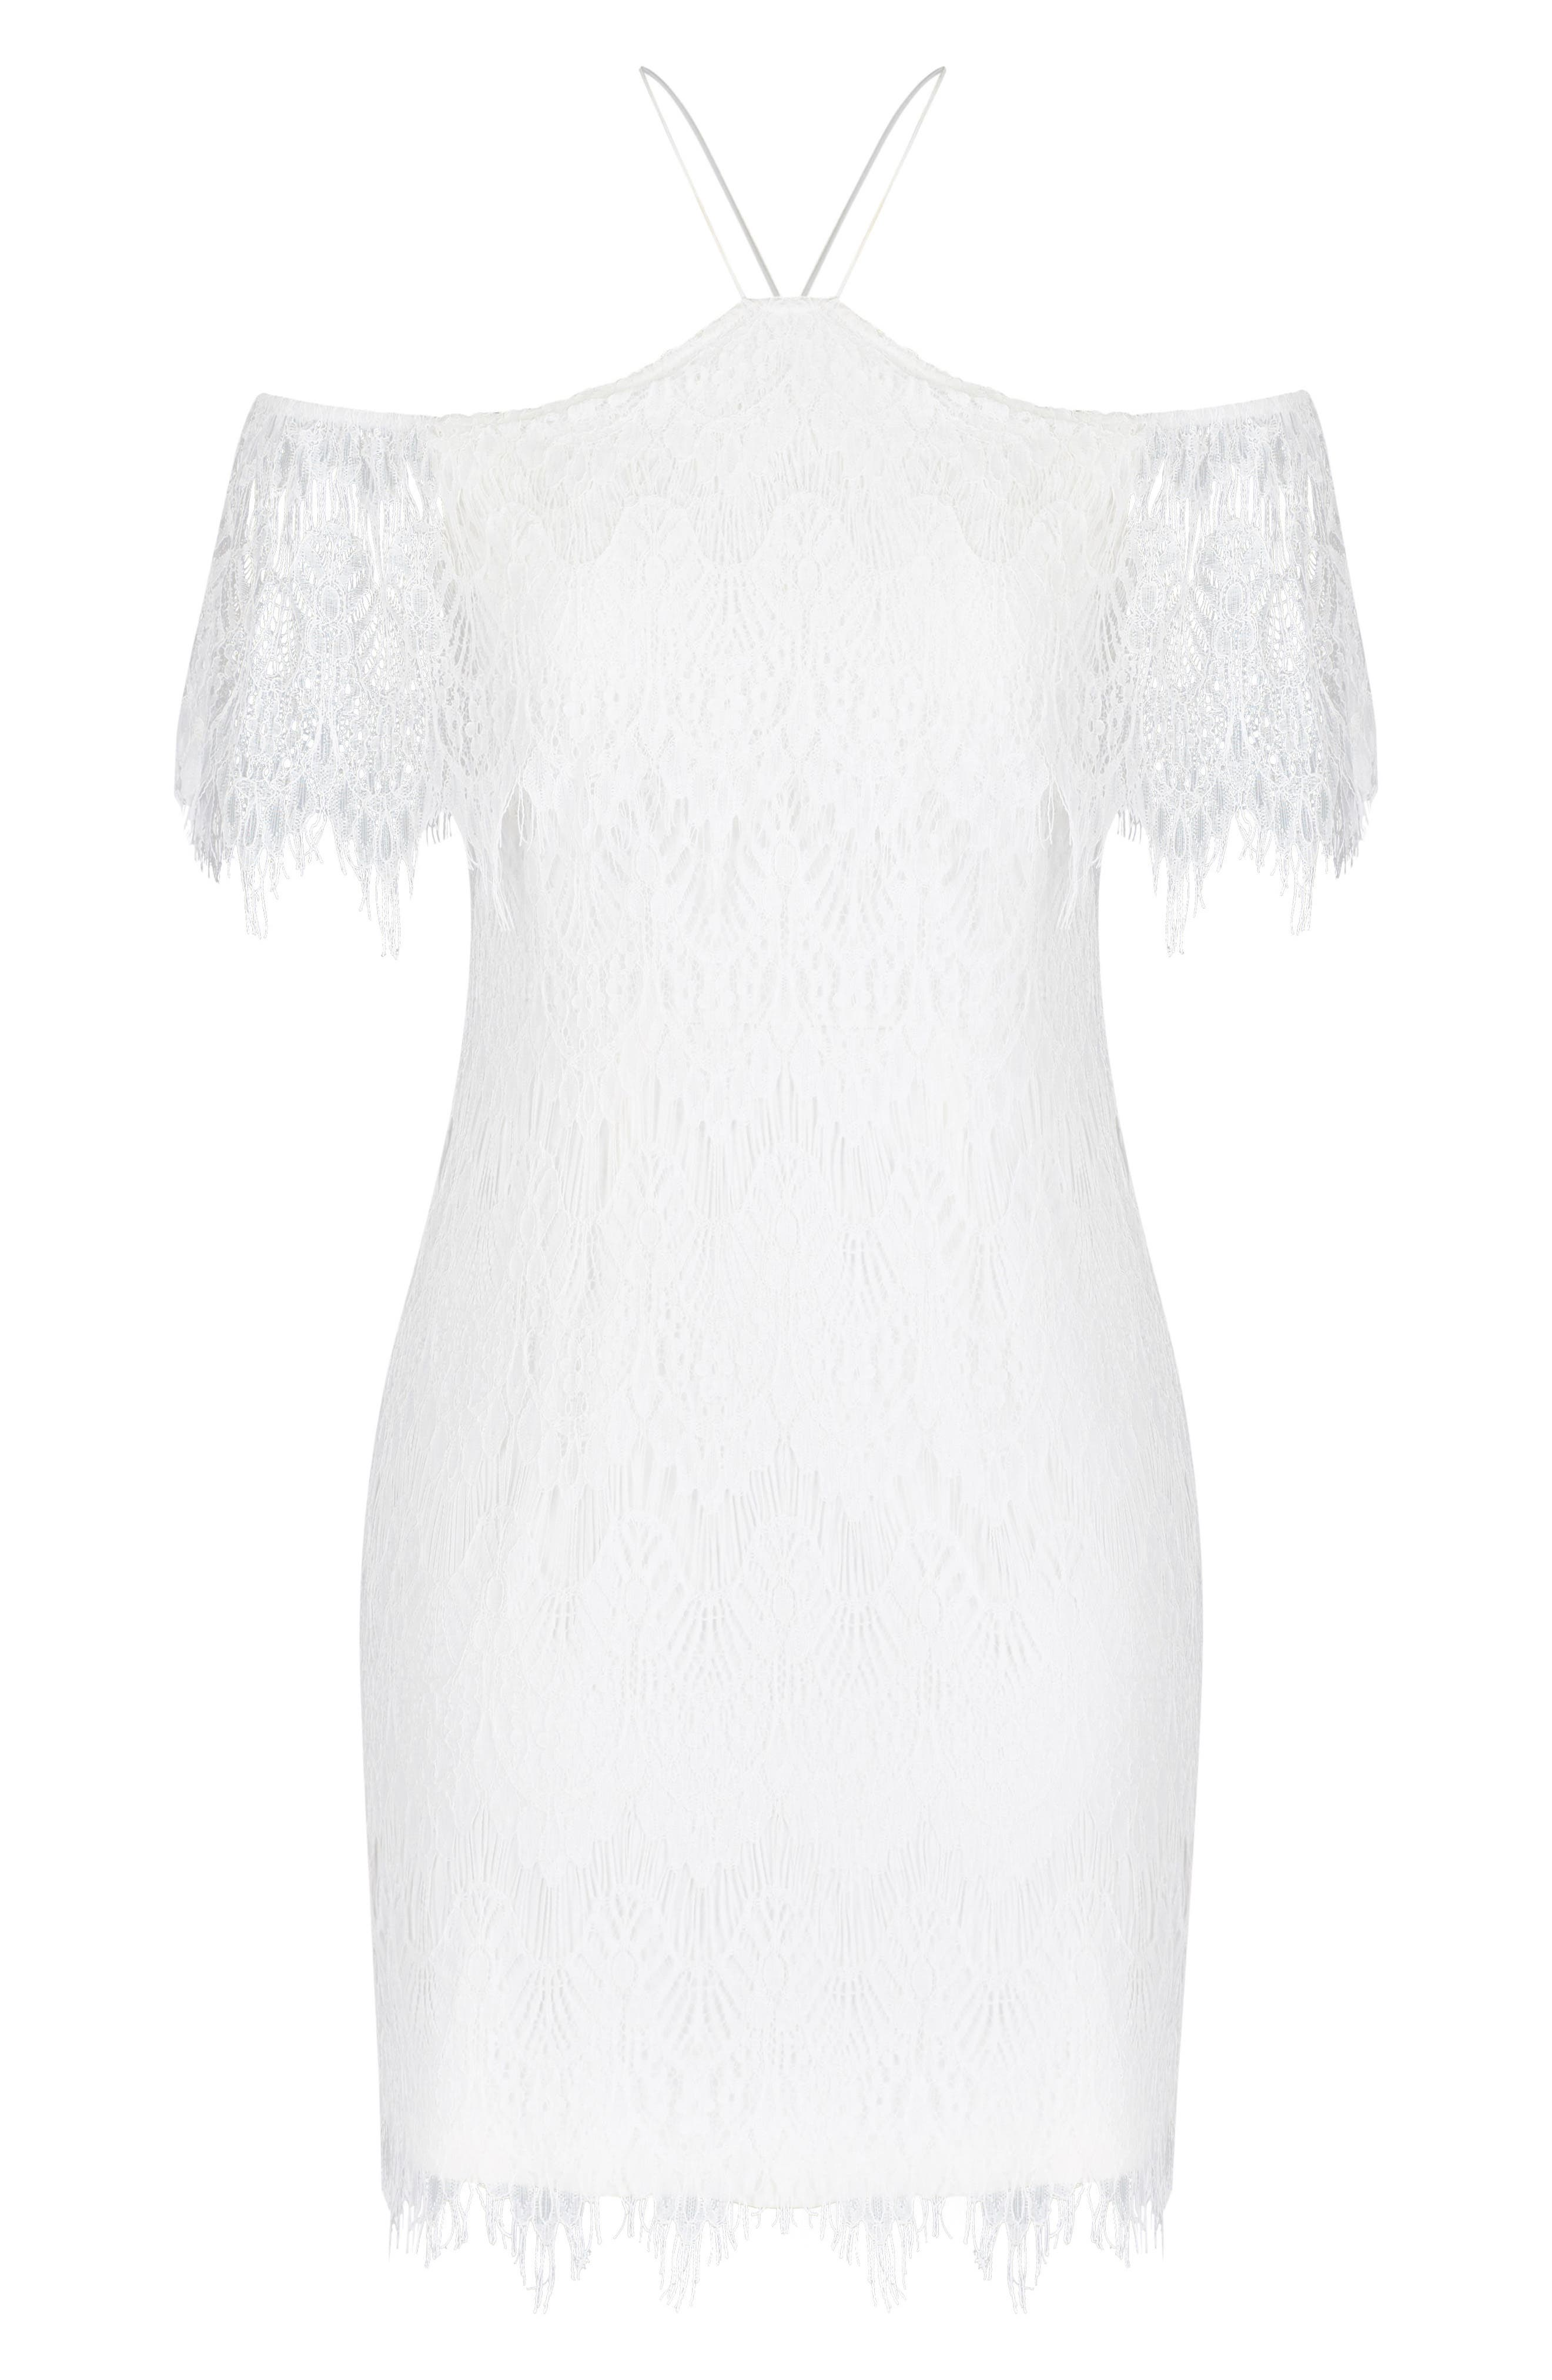 Lace Devotion Off the Shoulder Minidress,                             Alternate thumbnail 3, color,                             Ivory